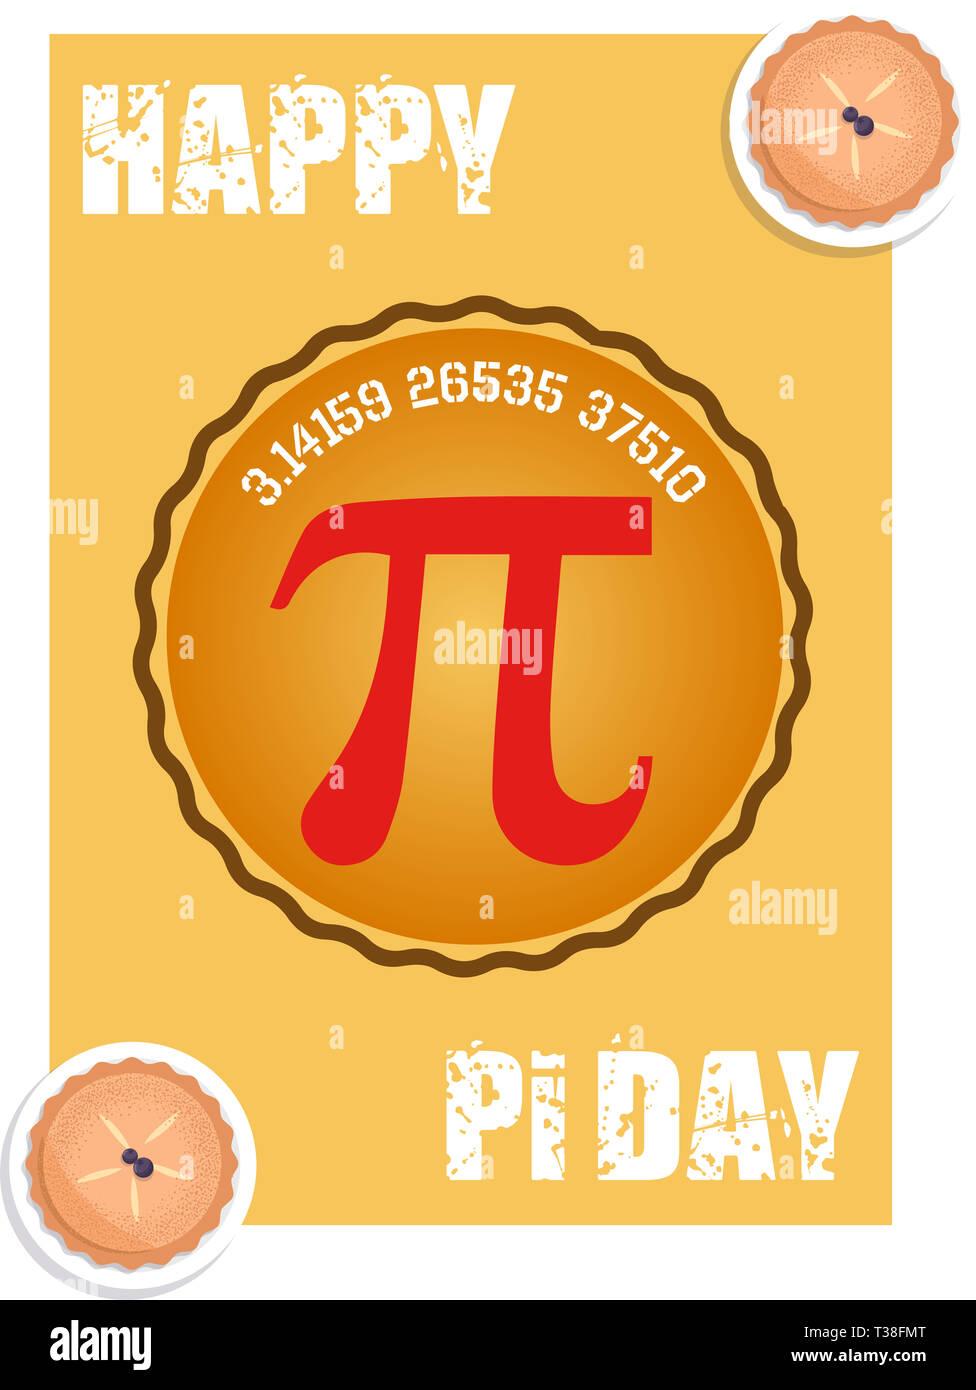 Mar_14_Pi Day-2 - Stock Image